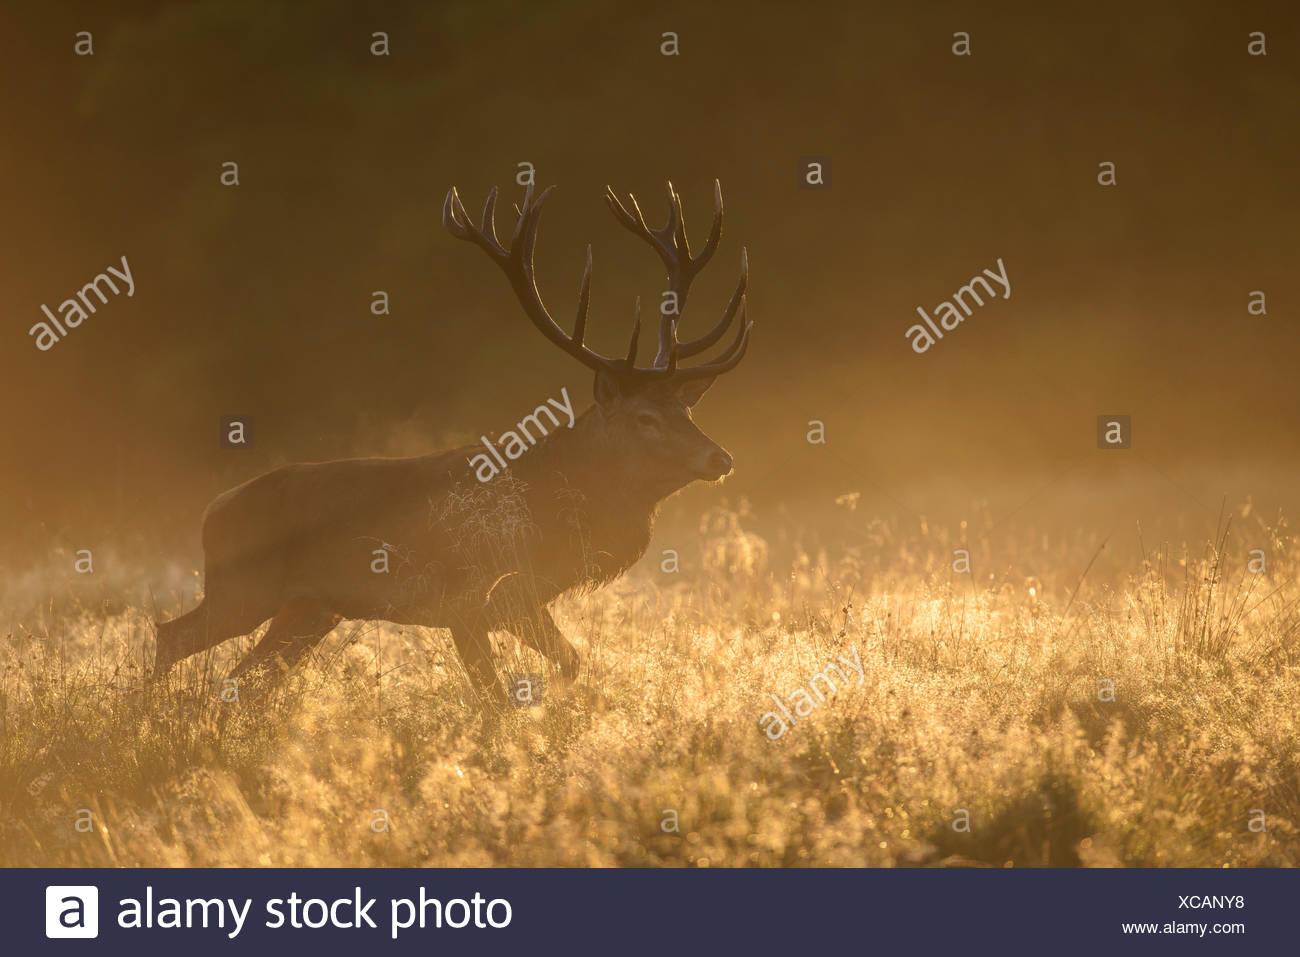 Red deer (Cervus elaphus), stag in first light, dewy meadow and fog, Zealand, Denmark - Stock Image